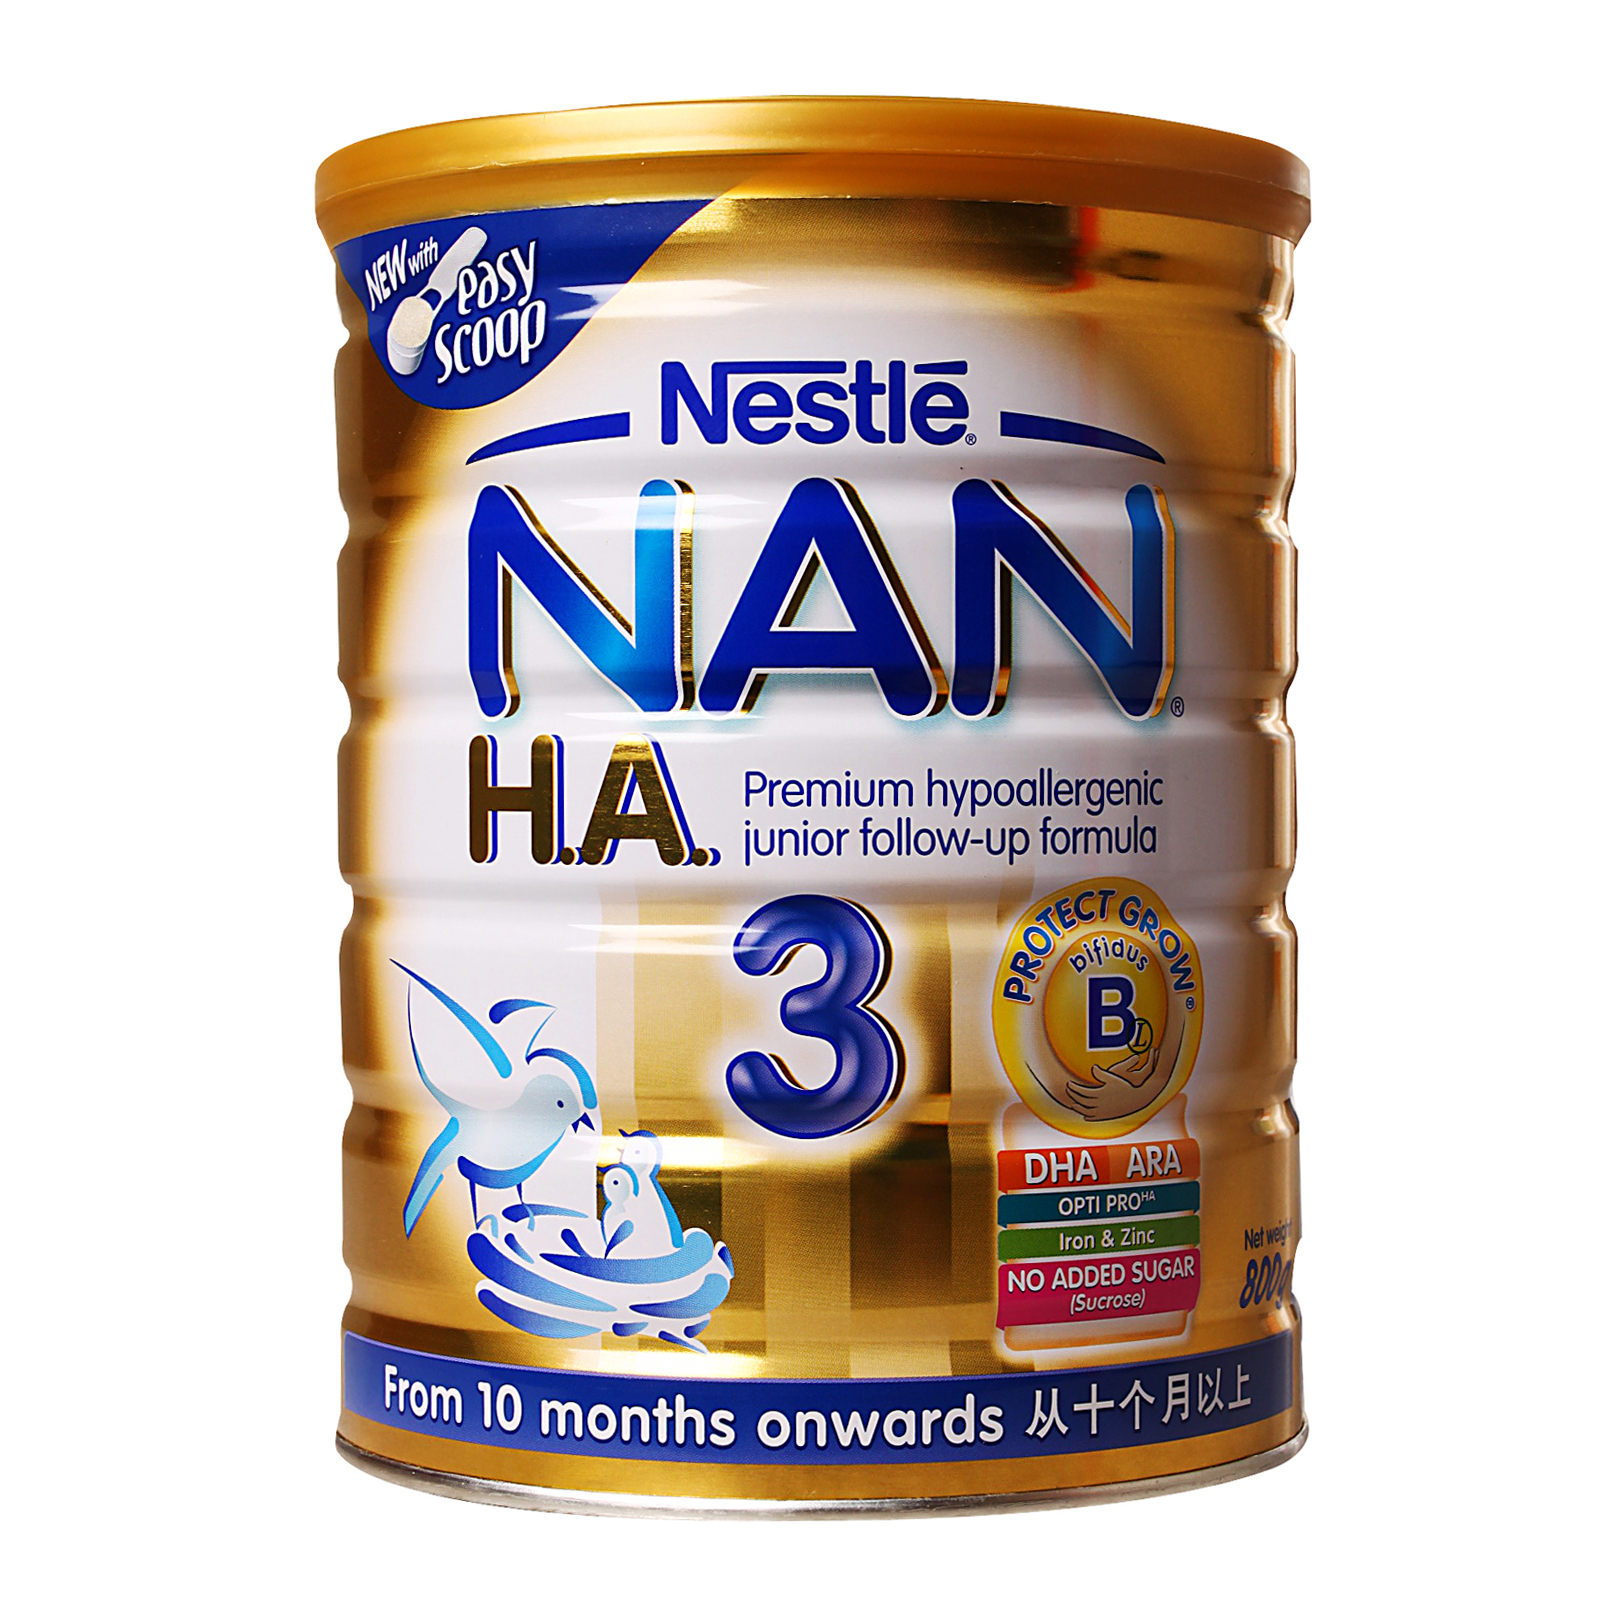 Nestlé Nan ha